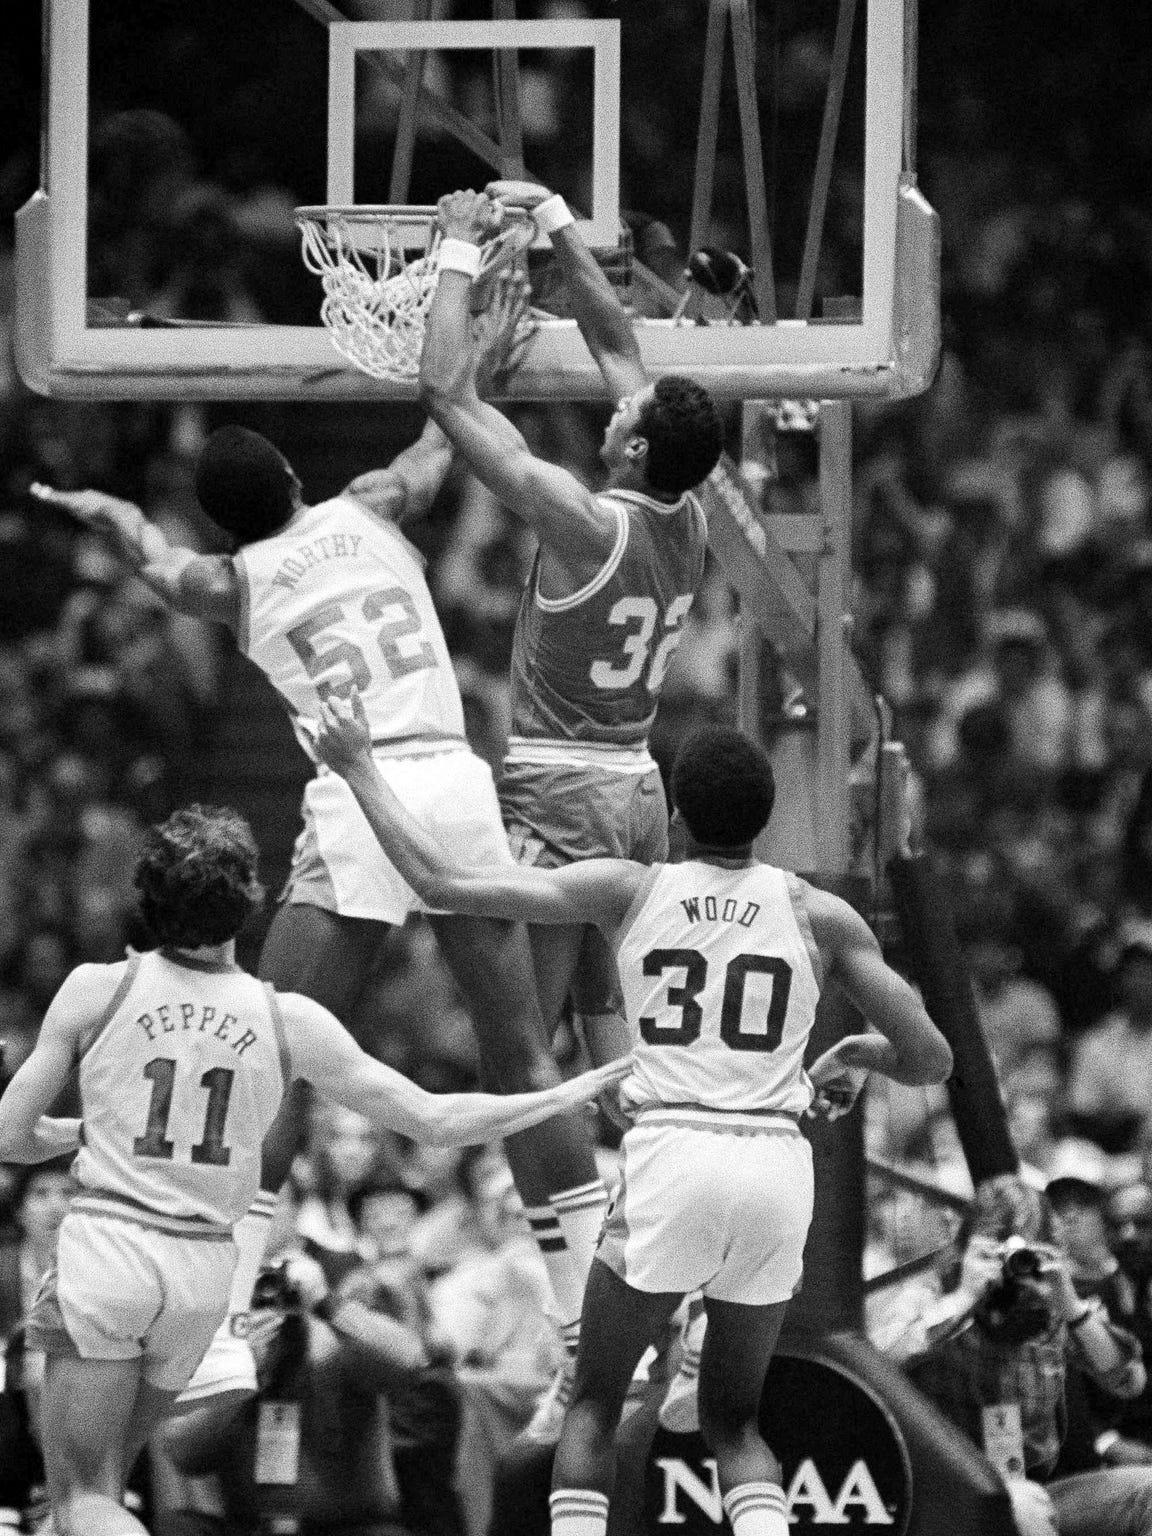 Indiana's Landon Turner dunks on North Carolina in the 1981 NCAA Championship game in Philadelphia. Turner's late-season resurgence fueled the Hoosiers' title run.